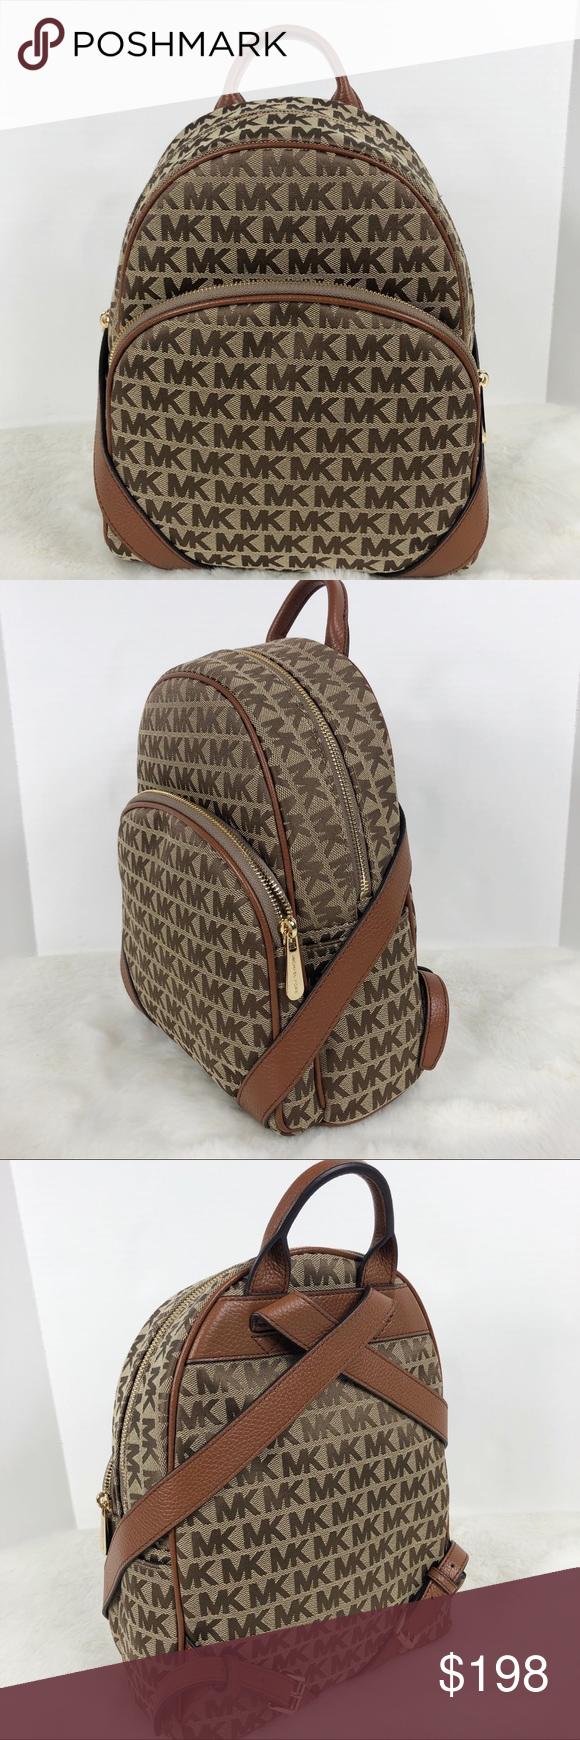 70817bbaa43c Michael Kors Abbey Medium Backpack brown Brand new Michael Kors Abbey  Backpack in brown. Size